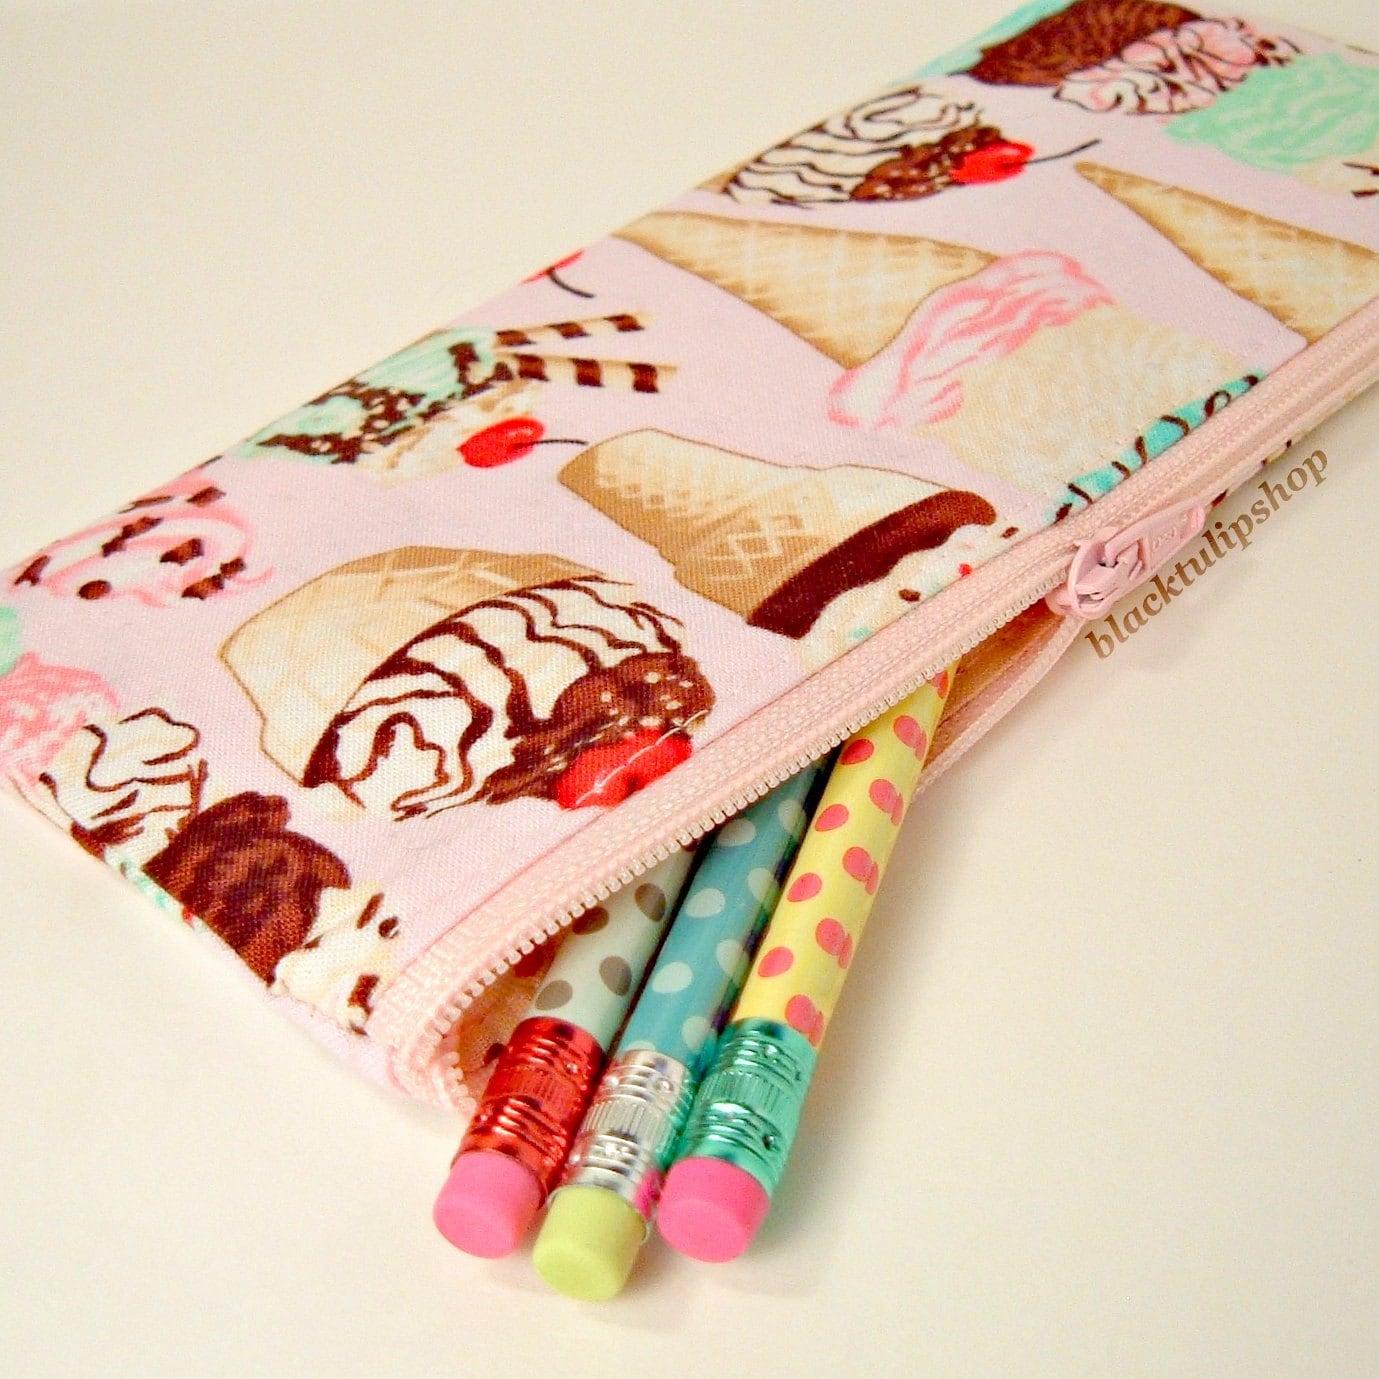 Cute Pencil Case Zipper Pouch Ice Cream Cones Treats Pink